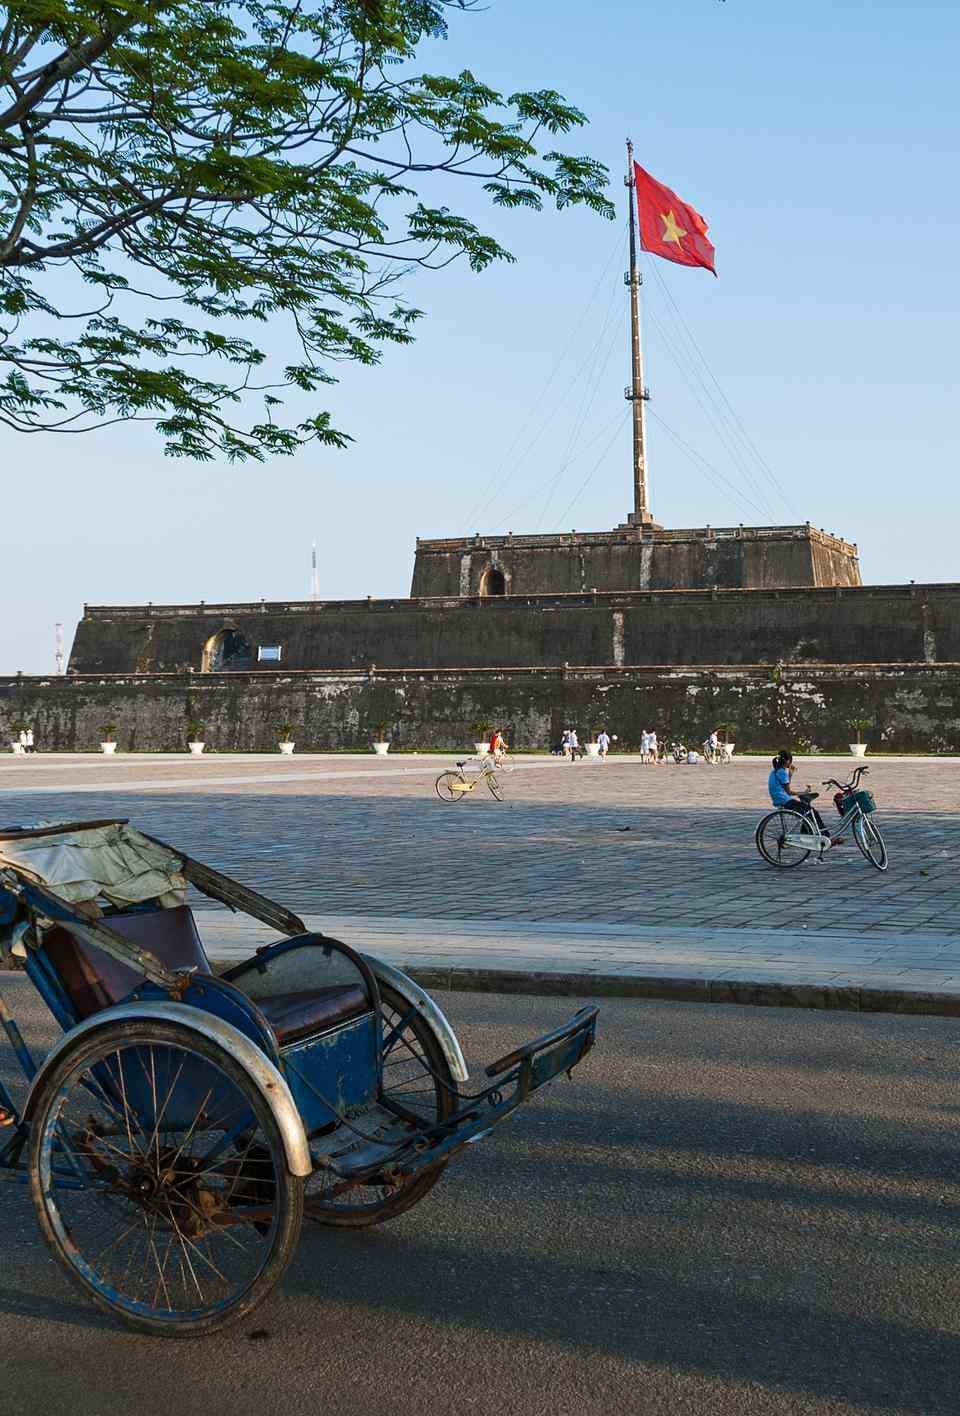 Cyclo driver in front of Hue Citadel, Vietnam